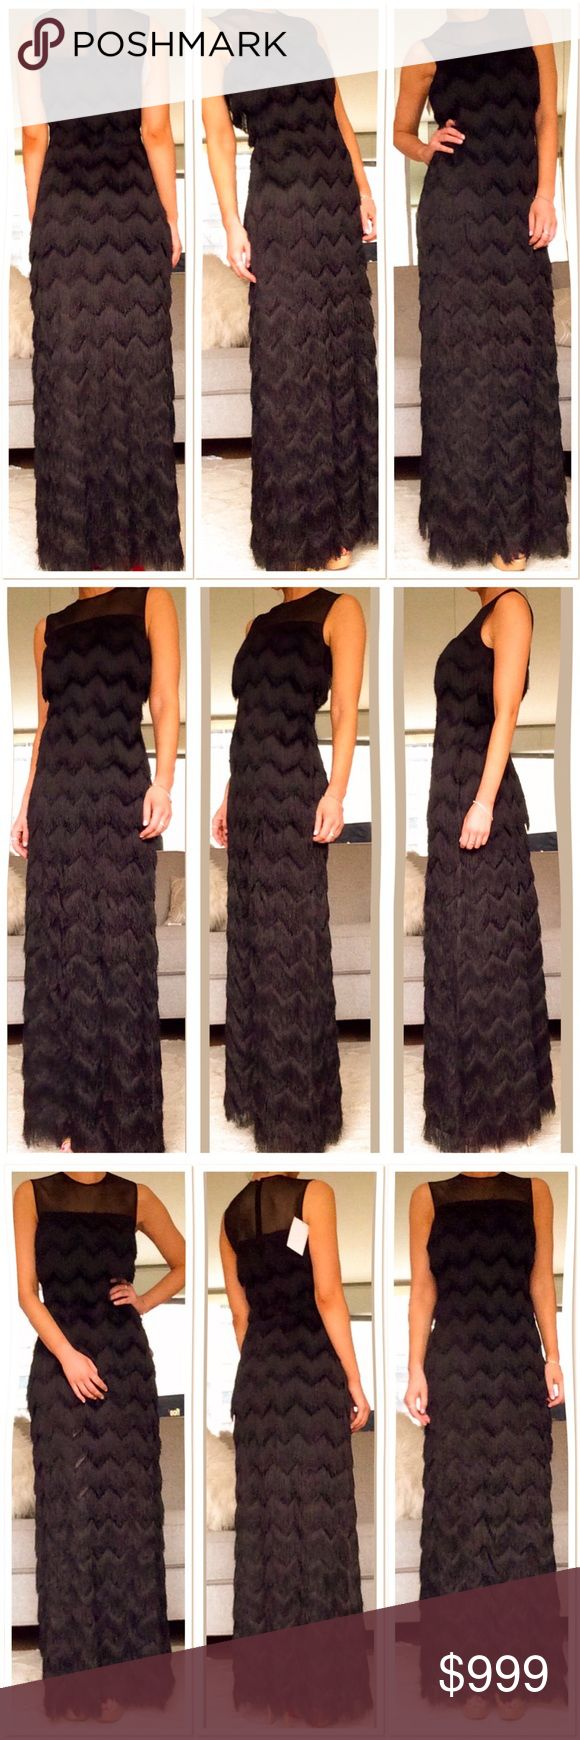 Additional Photos of Alexis Dress Please see original listing. alexis Dresses Maxi